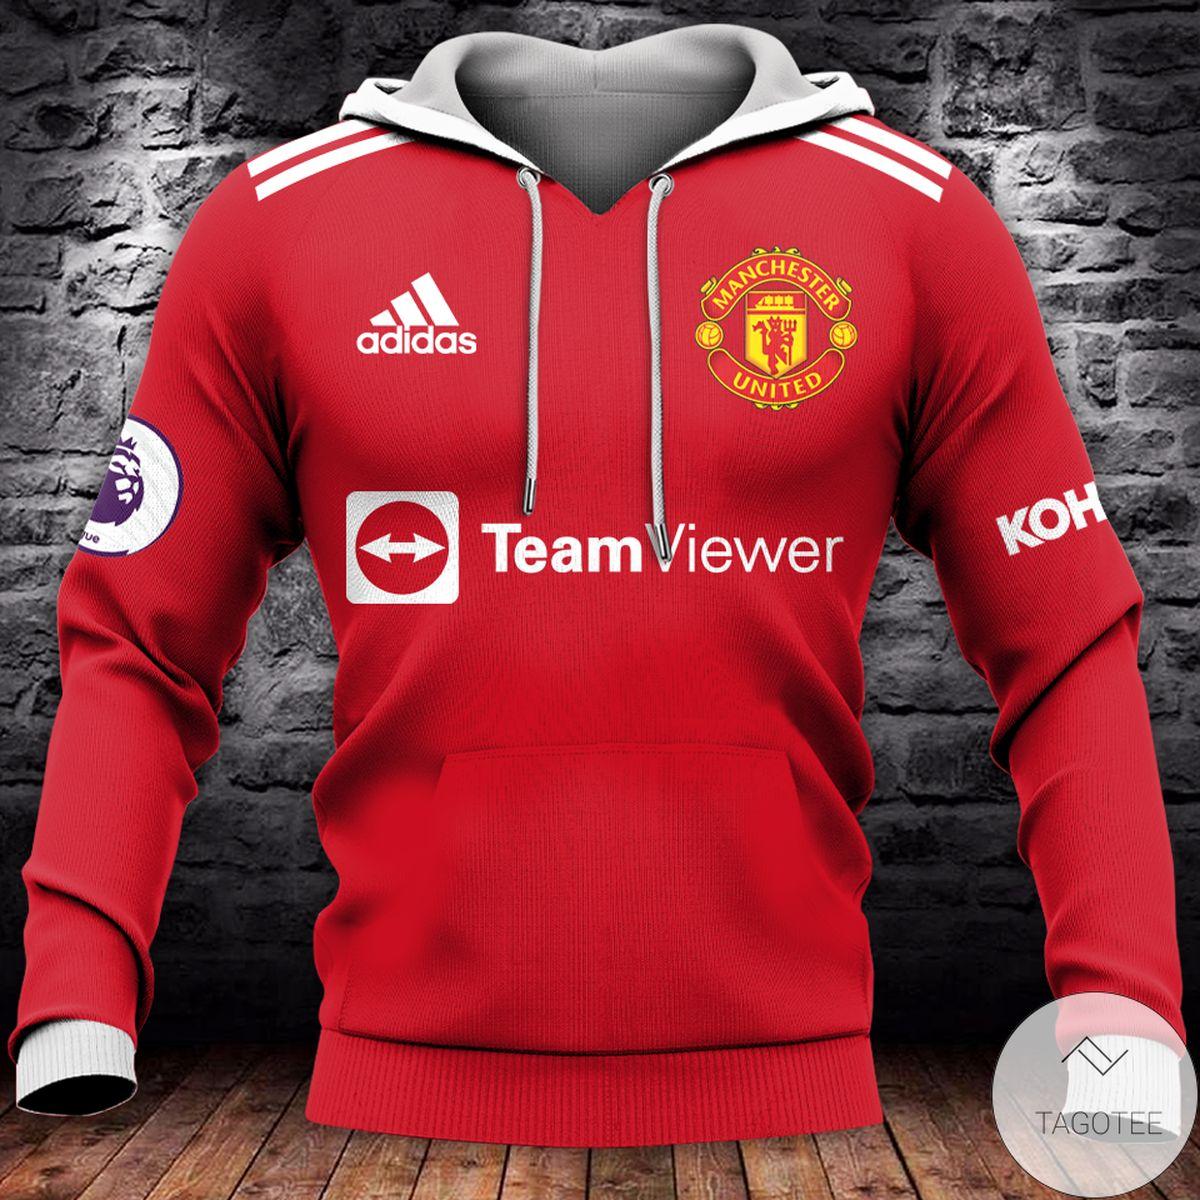 Adidas Manchester United Teamviewer 3d Hoodie